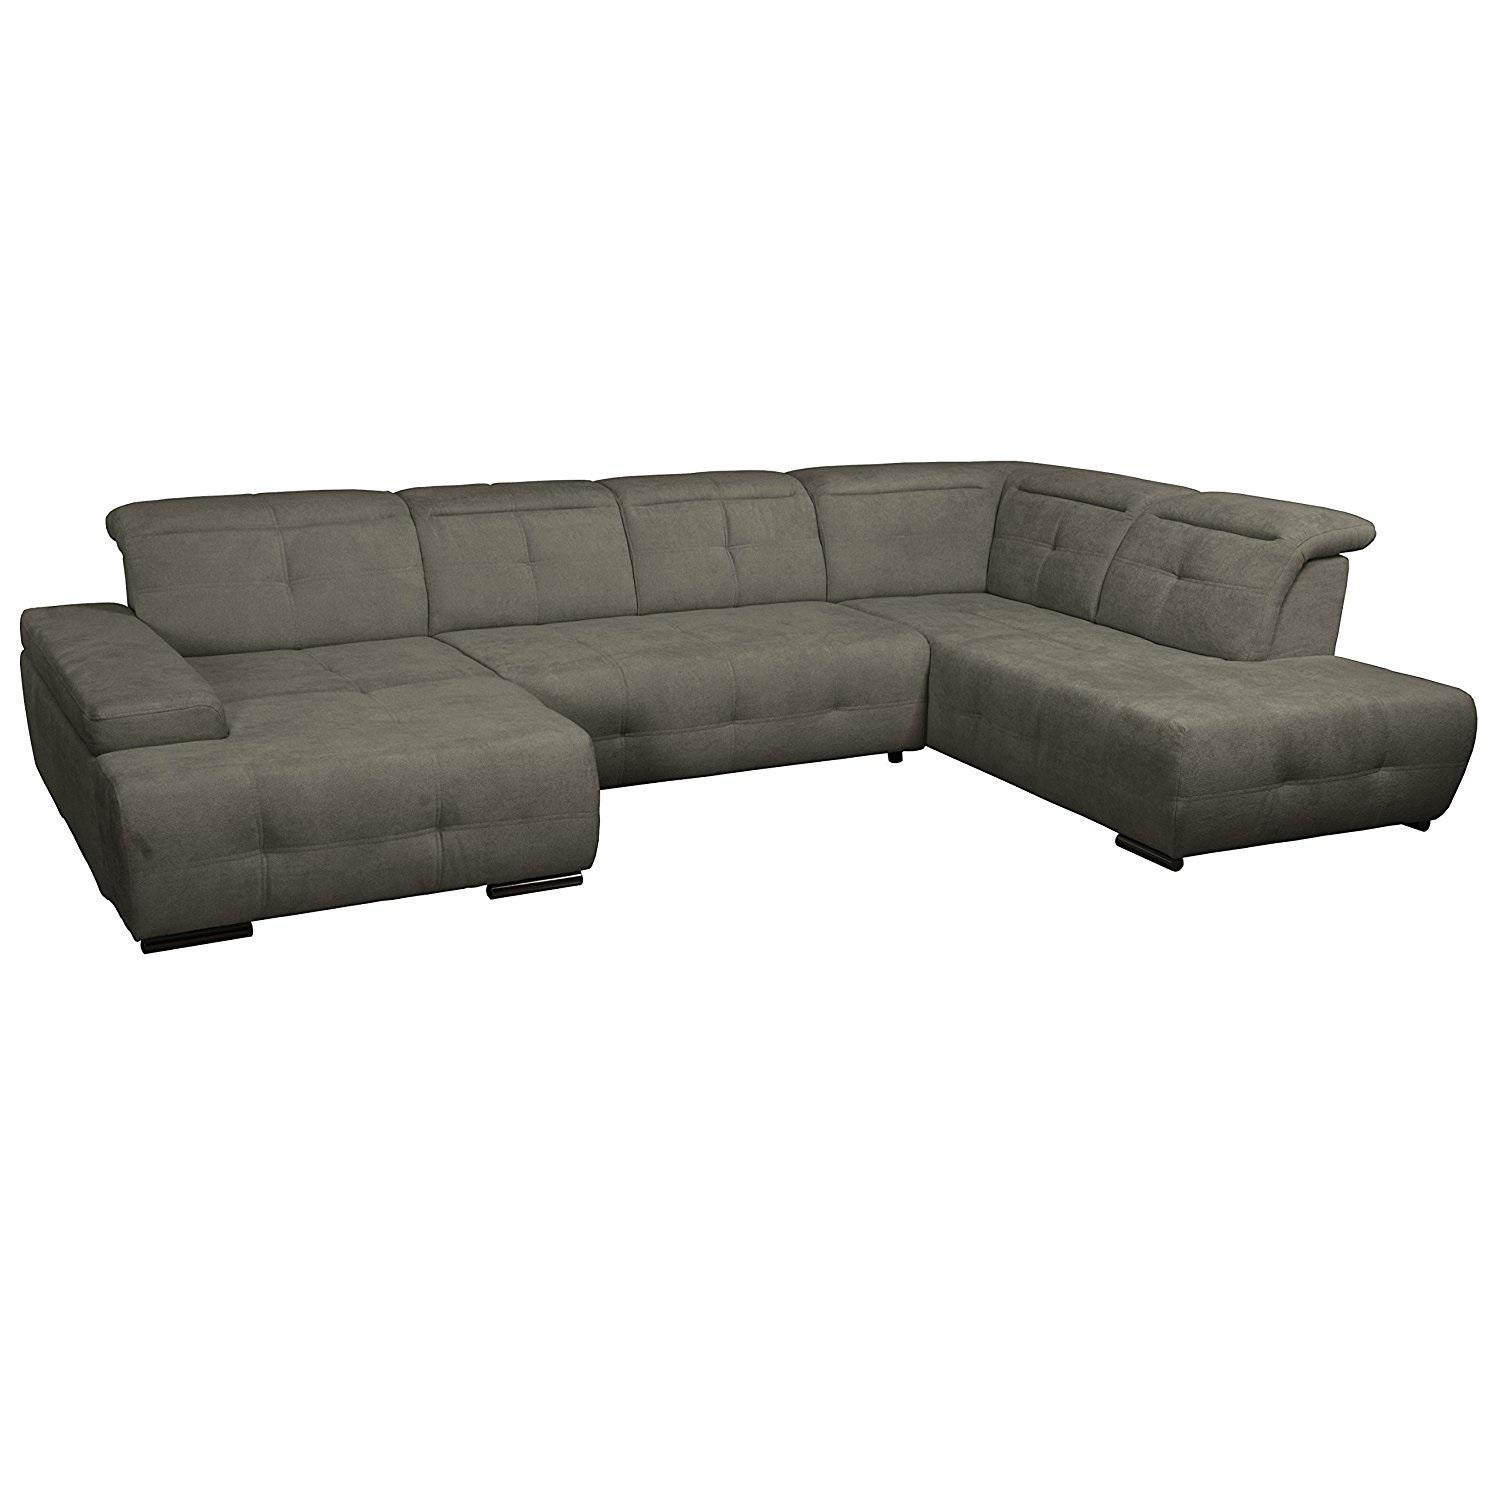 cavadore wohnlandschaft mistrel gro e sofalandschaft mit ottomanen rechts und xl longchair. Black Bedroom Furniture Sets. Home Design Ideas